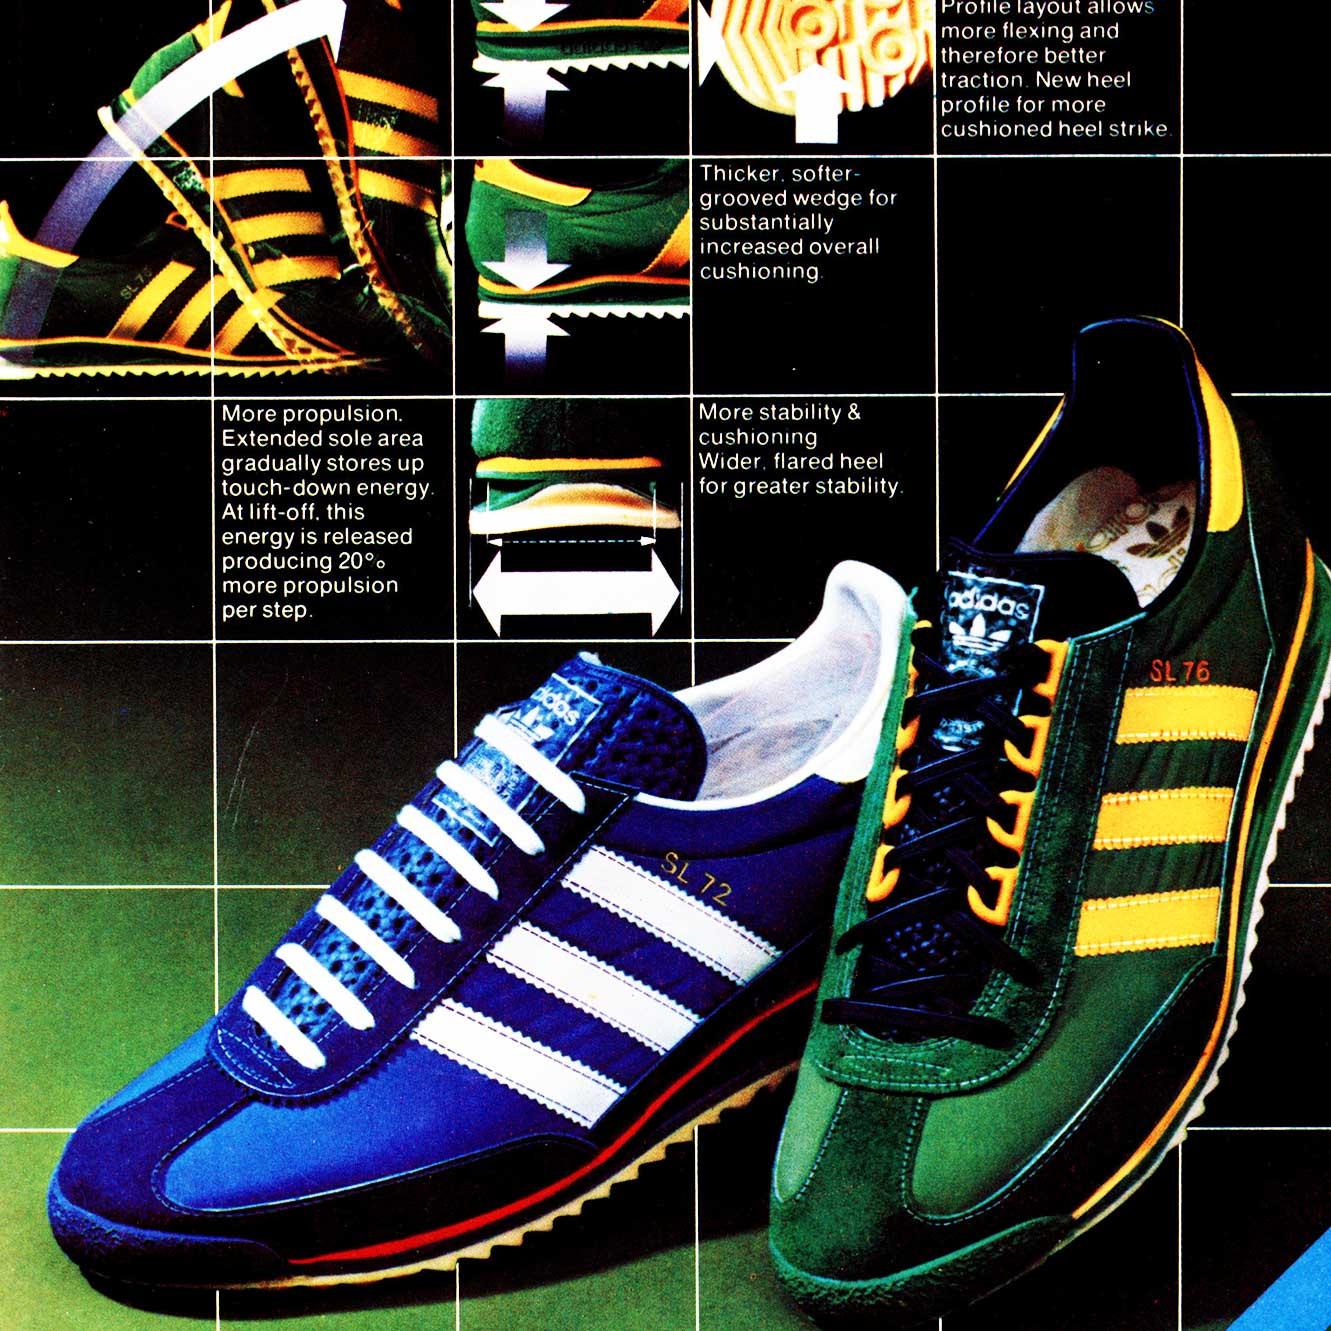 Adidas SL72 and SL76 vintage sneaker ad